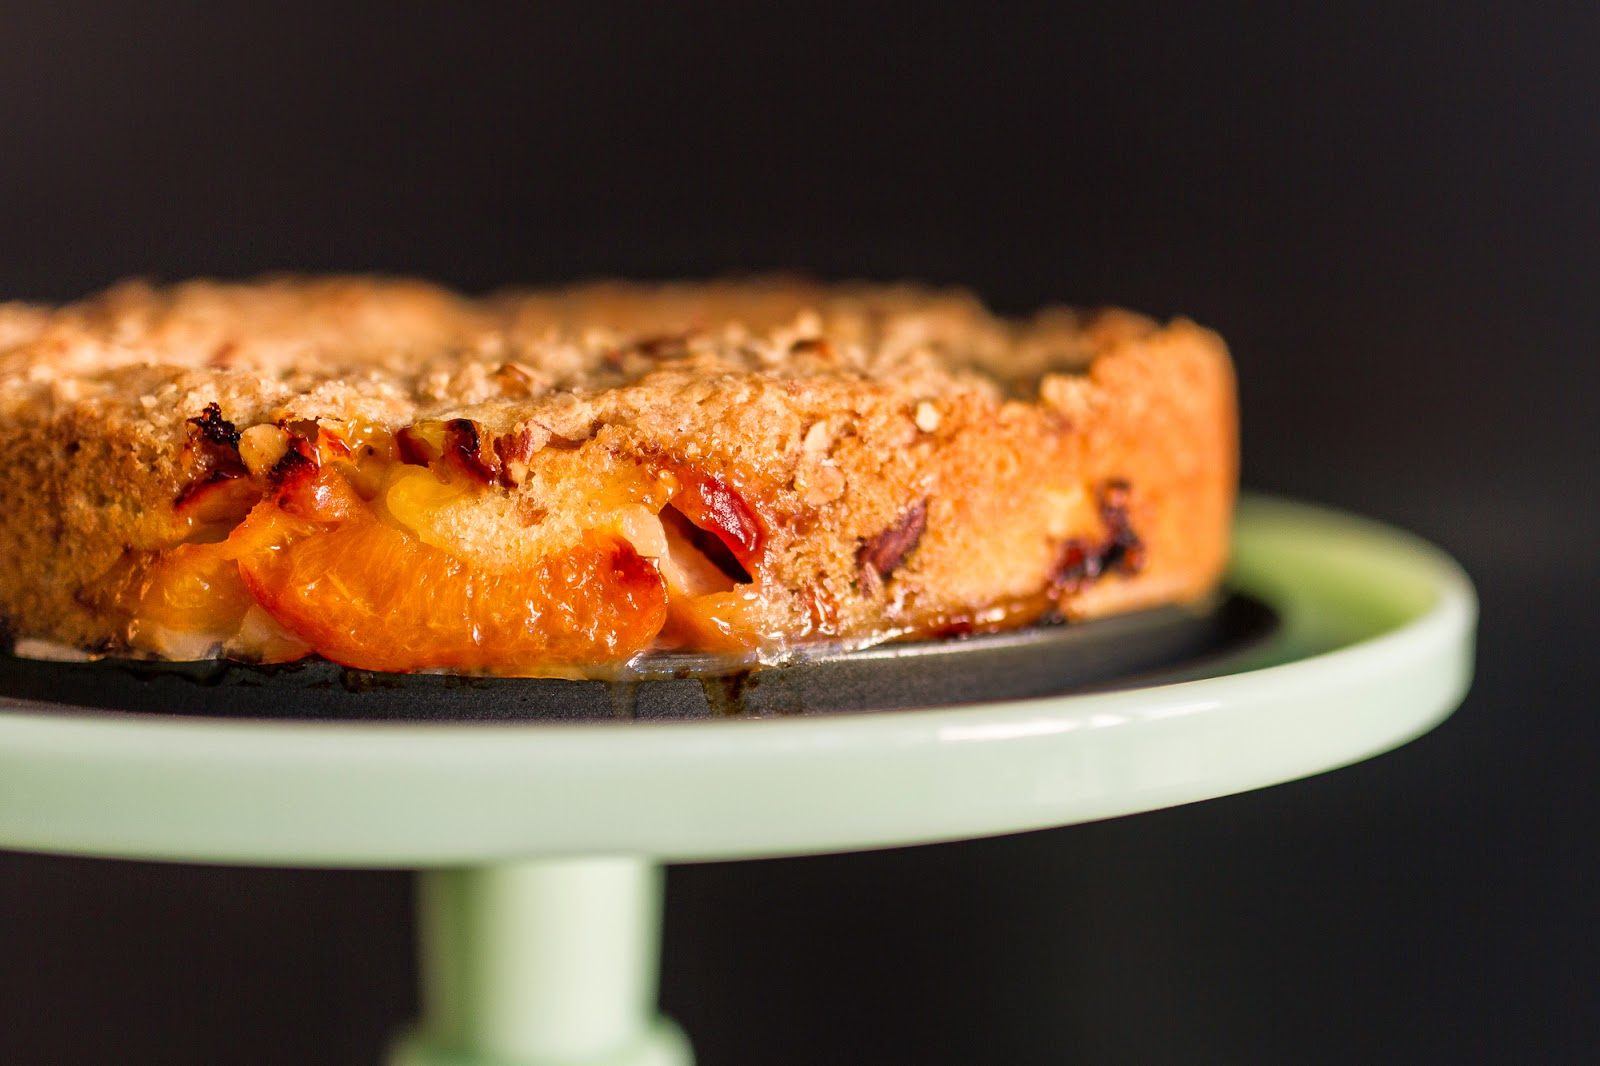 The Joy of Cooking's Apricot Kuchen